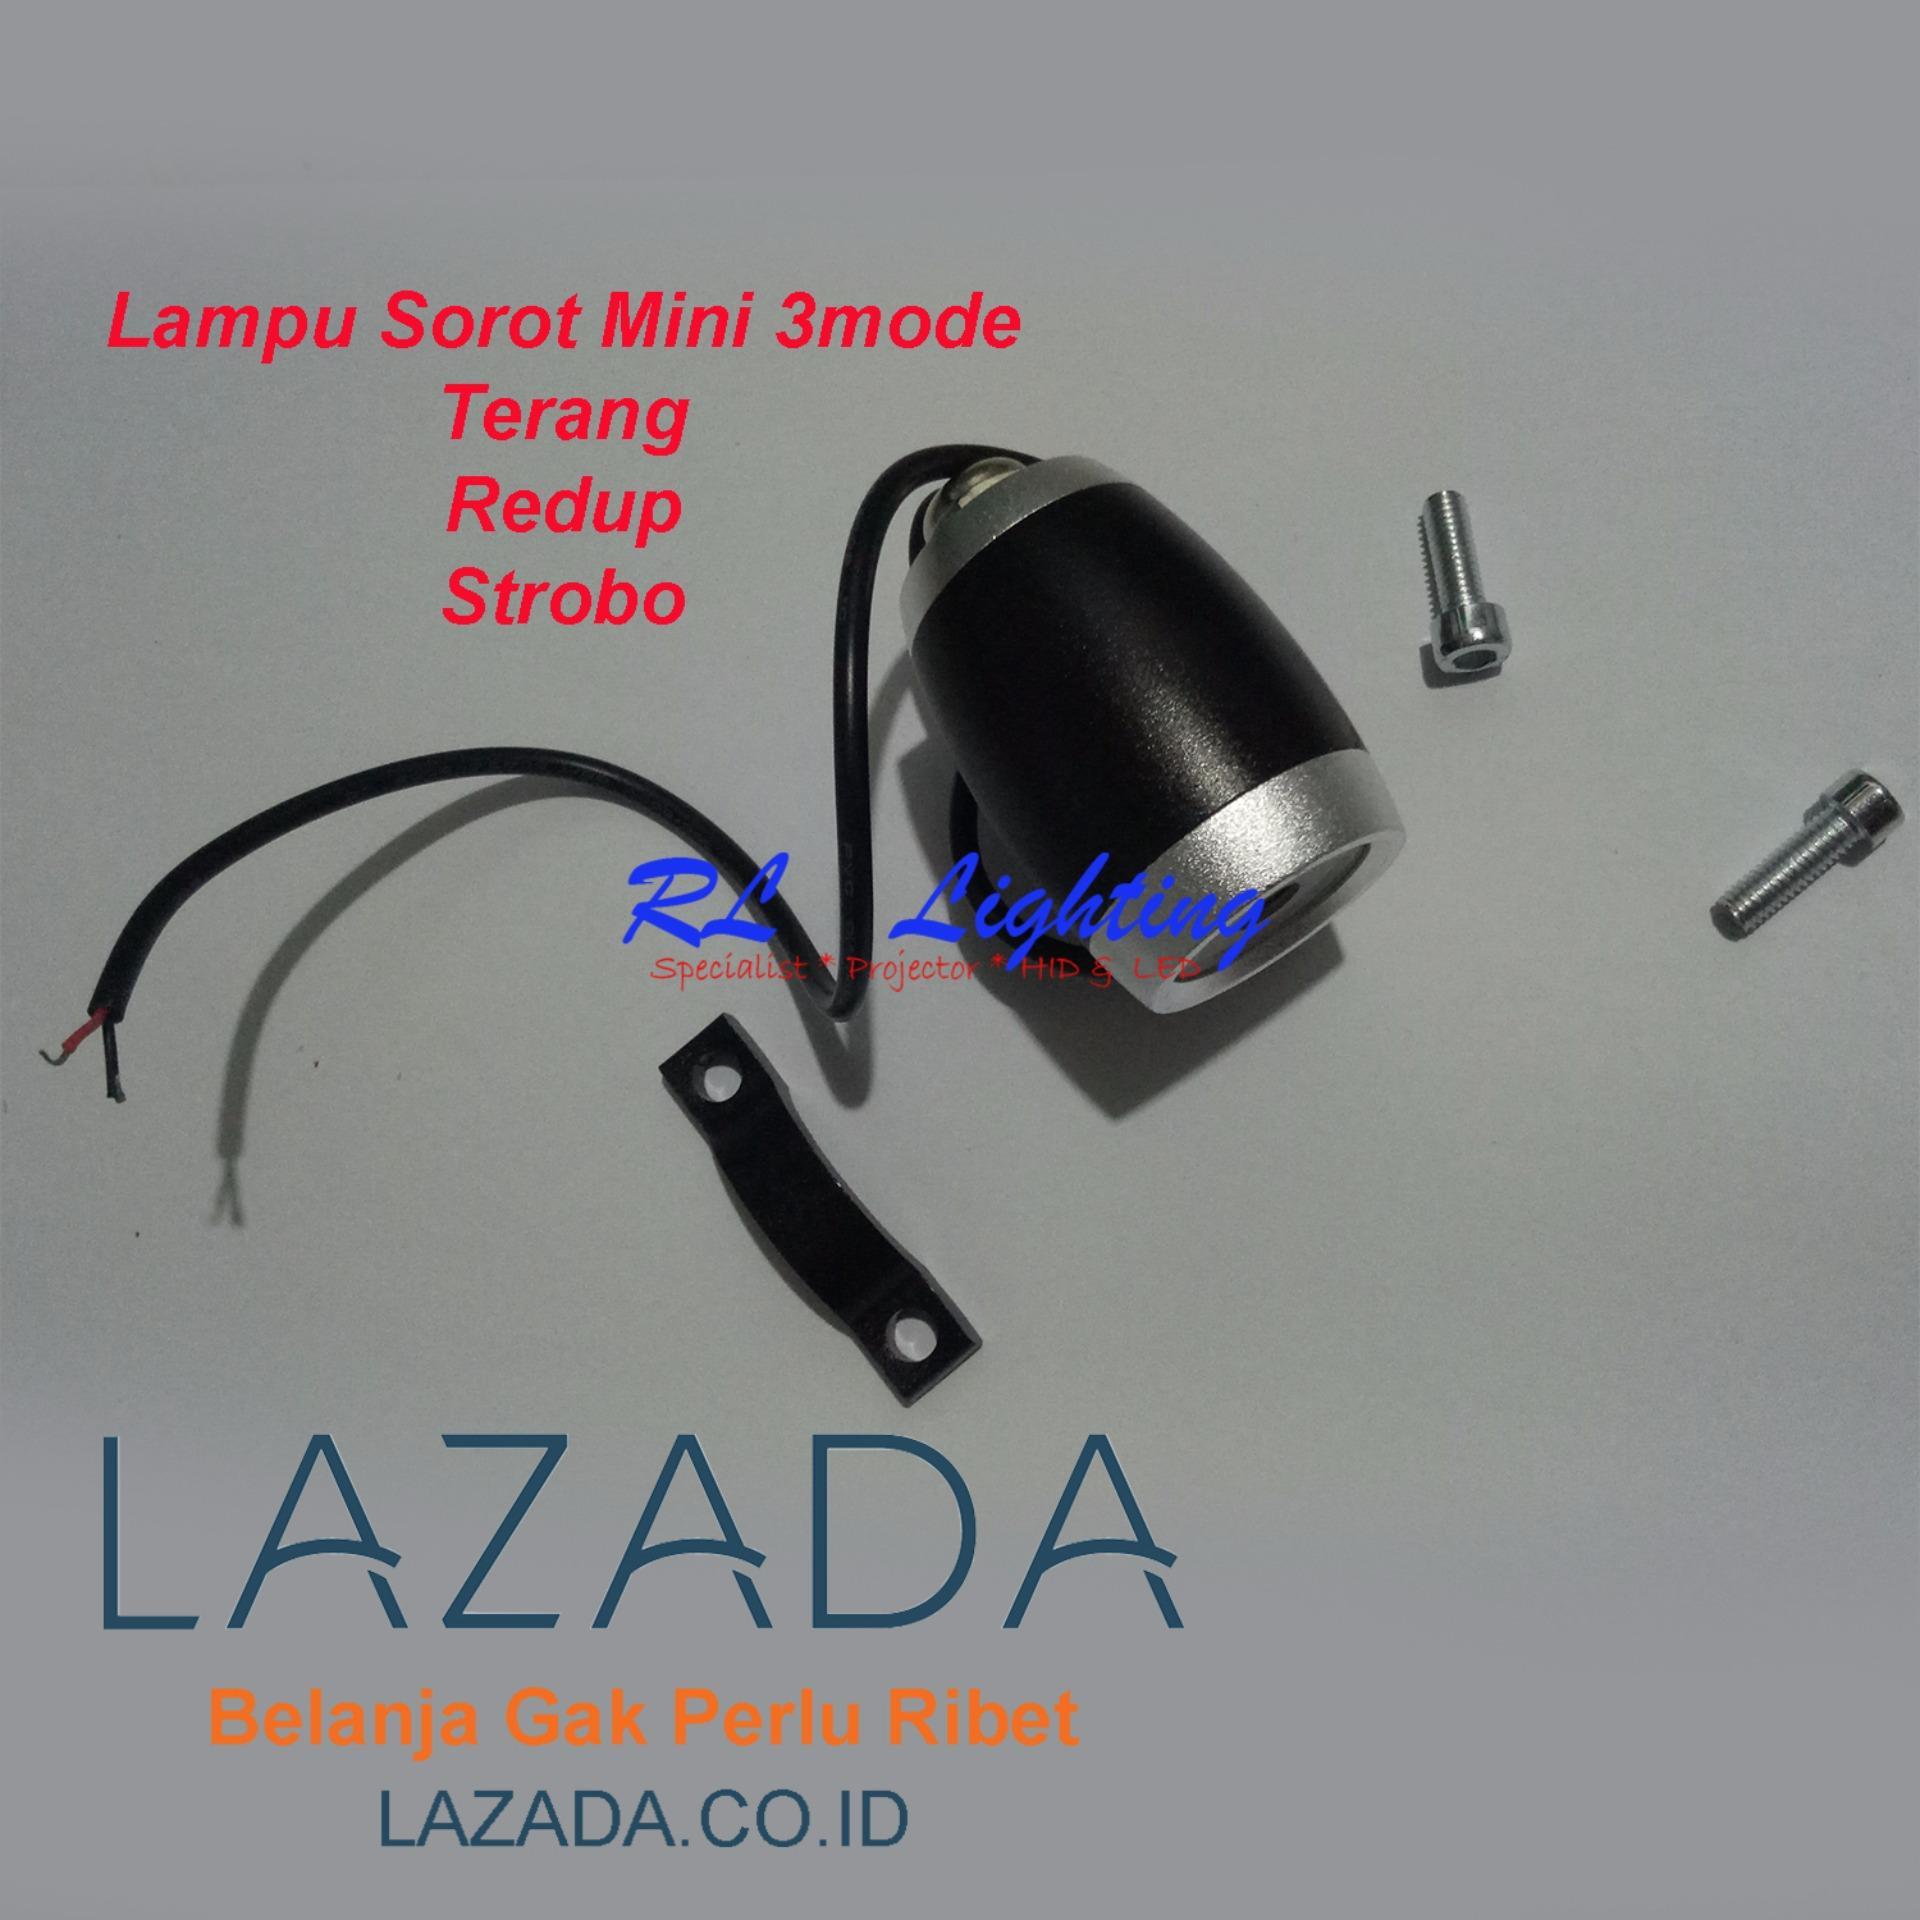 Tmpoto Strobo Biru Colok Lighter Daftar Harga Terbaru Roof Top Atap Federal Signal 6 X Ori Led Sorot Mini 3mode